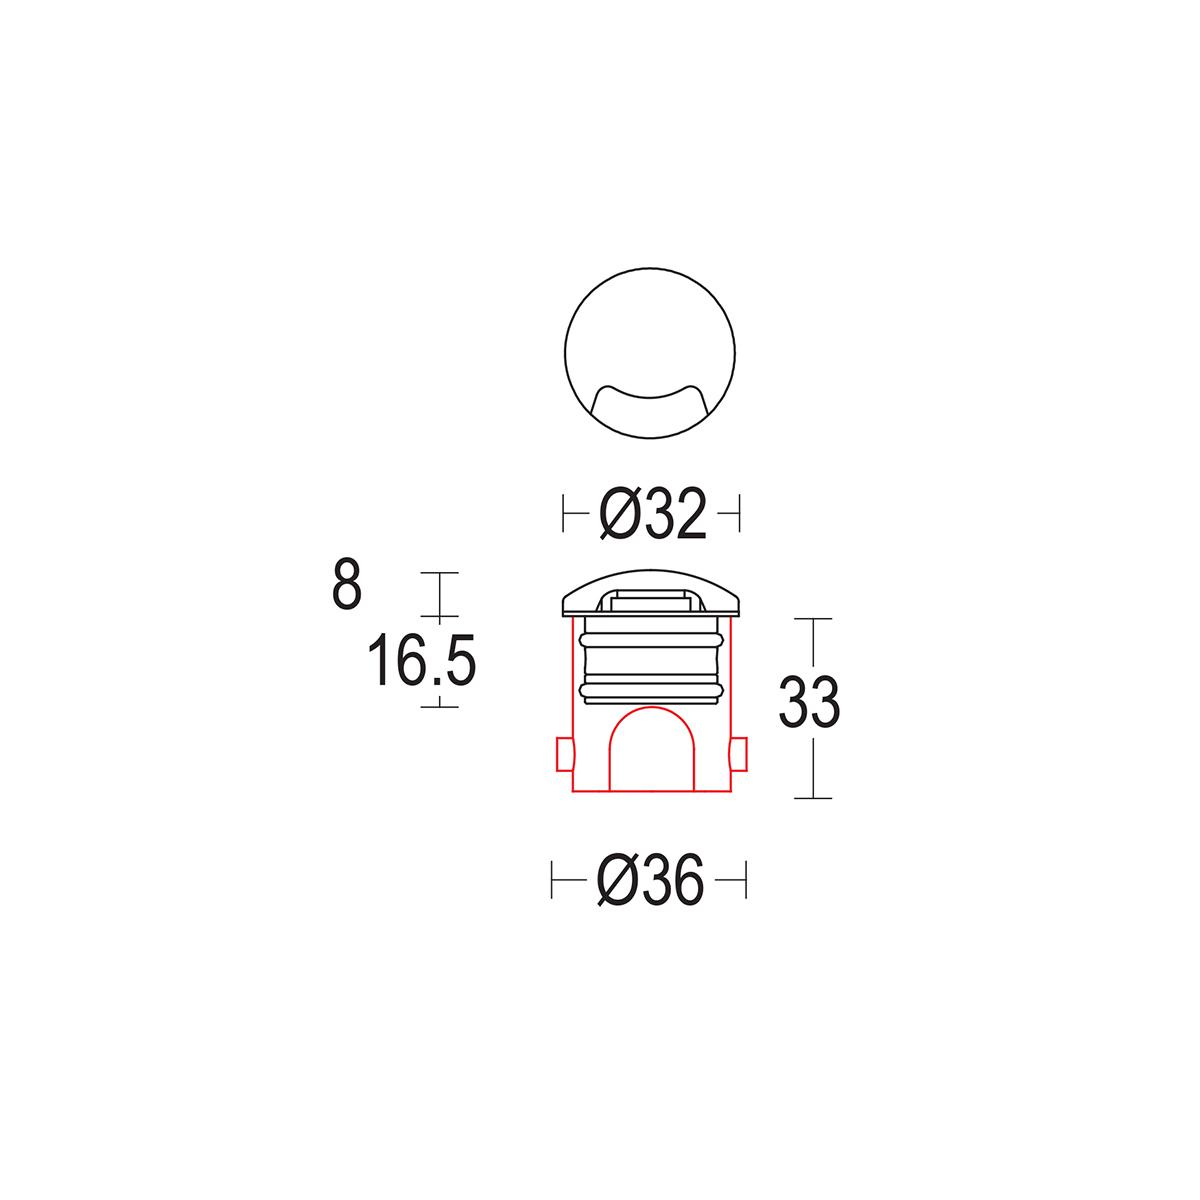 чертеж Microsegno walk 32 Ghidini уличный светильник GH1377.BAXO300EC